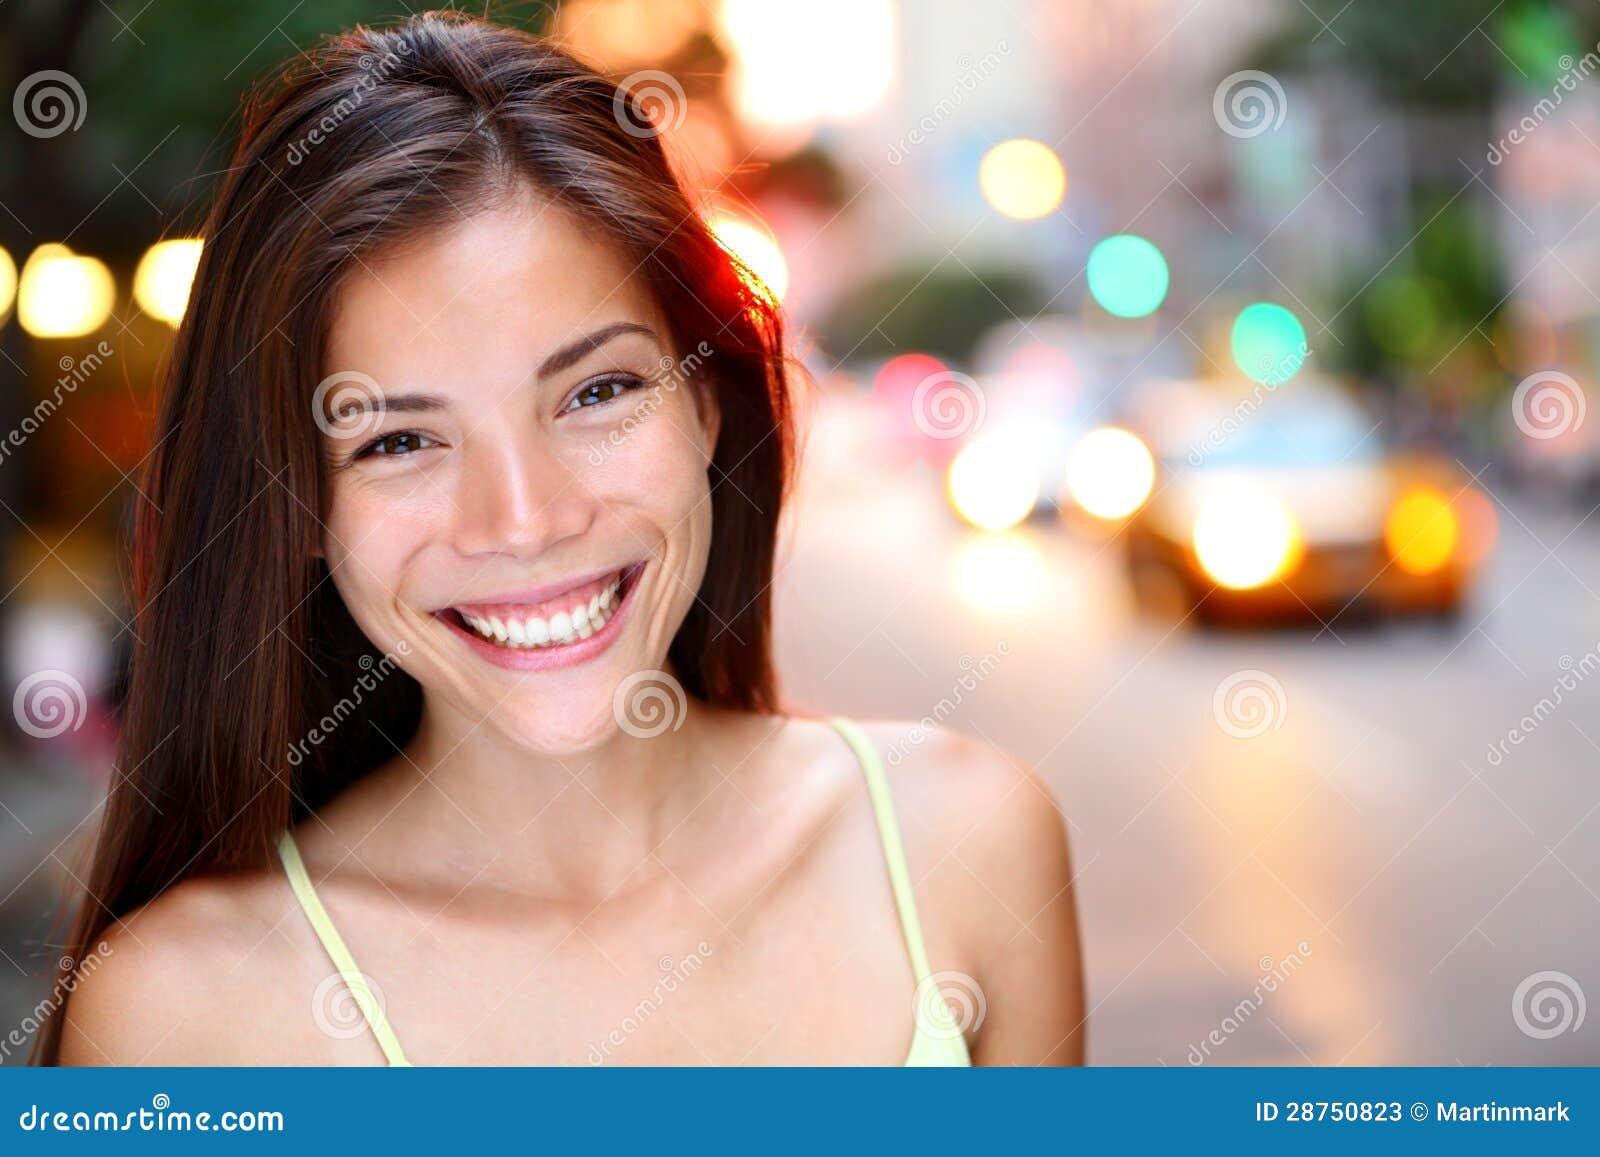 New york asian women dating